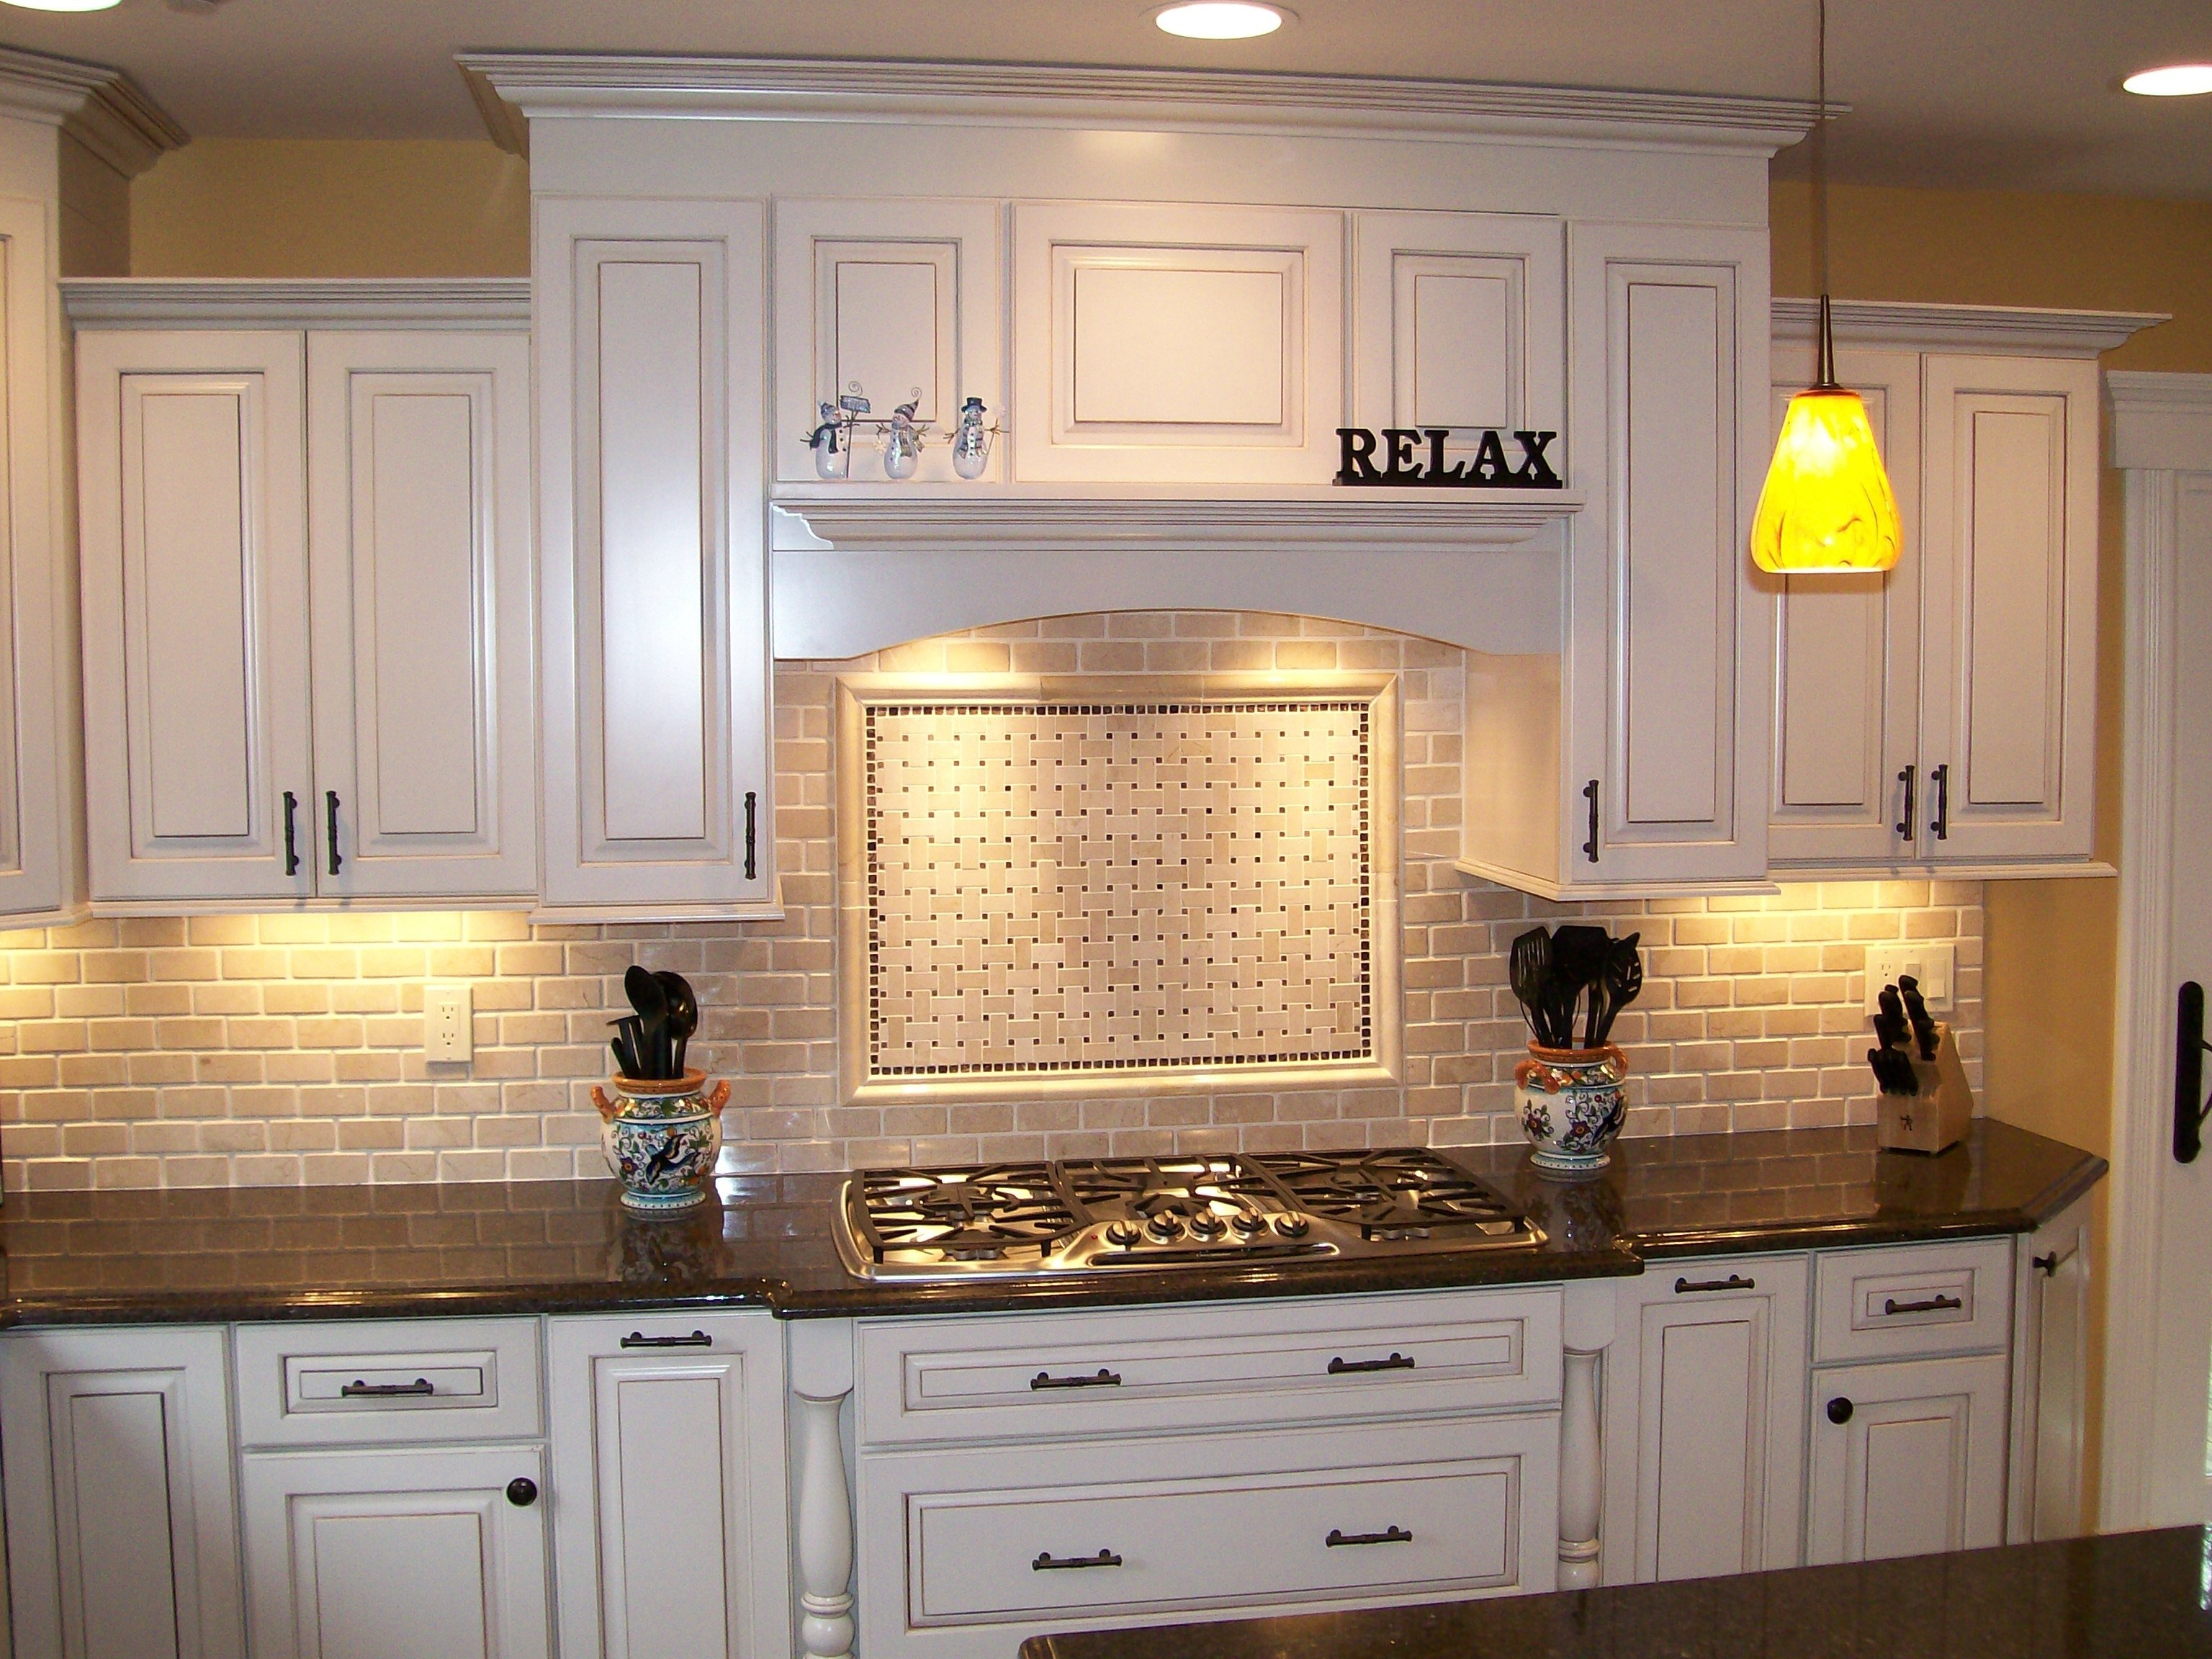 10 Gorgeous Ideas For Kitchen Backsplash With Granite Countertops inspiration kitchen backsplashes kitchen backsplash designs with 1 2020